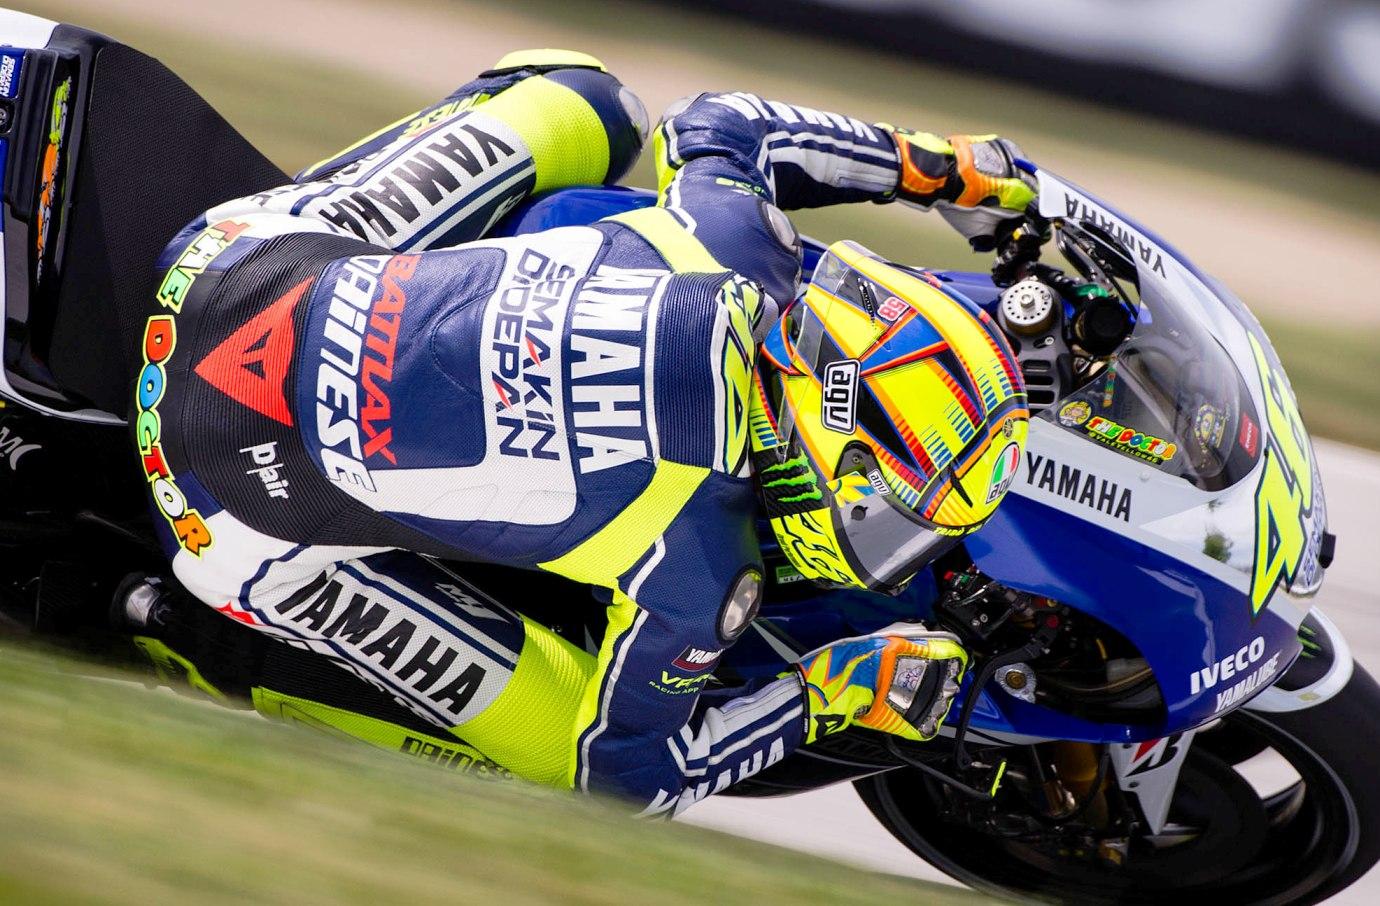 Hasil Latihan Bebas MotoGP Indianapolis 2014: Rossi Kuasai FP1